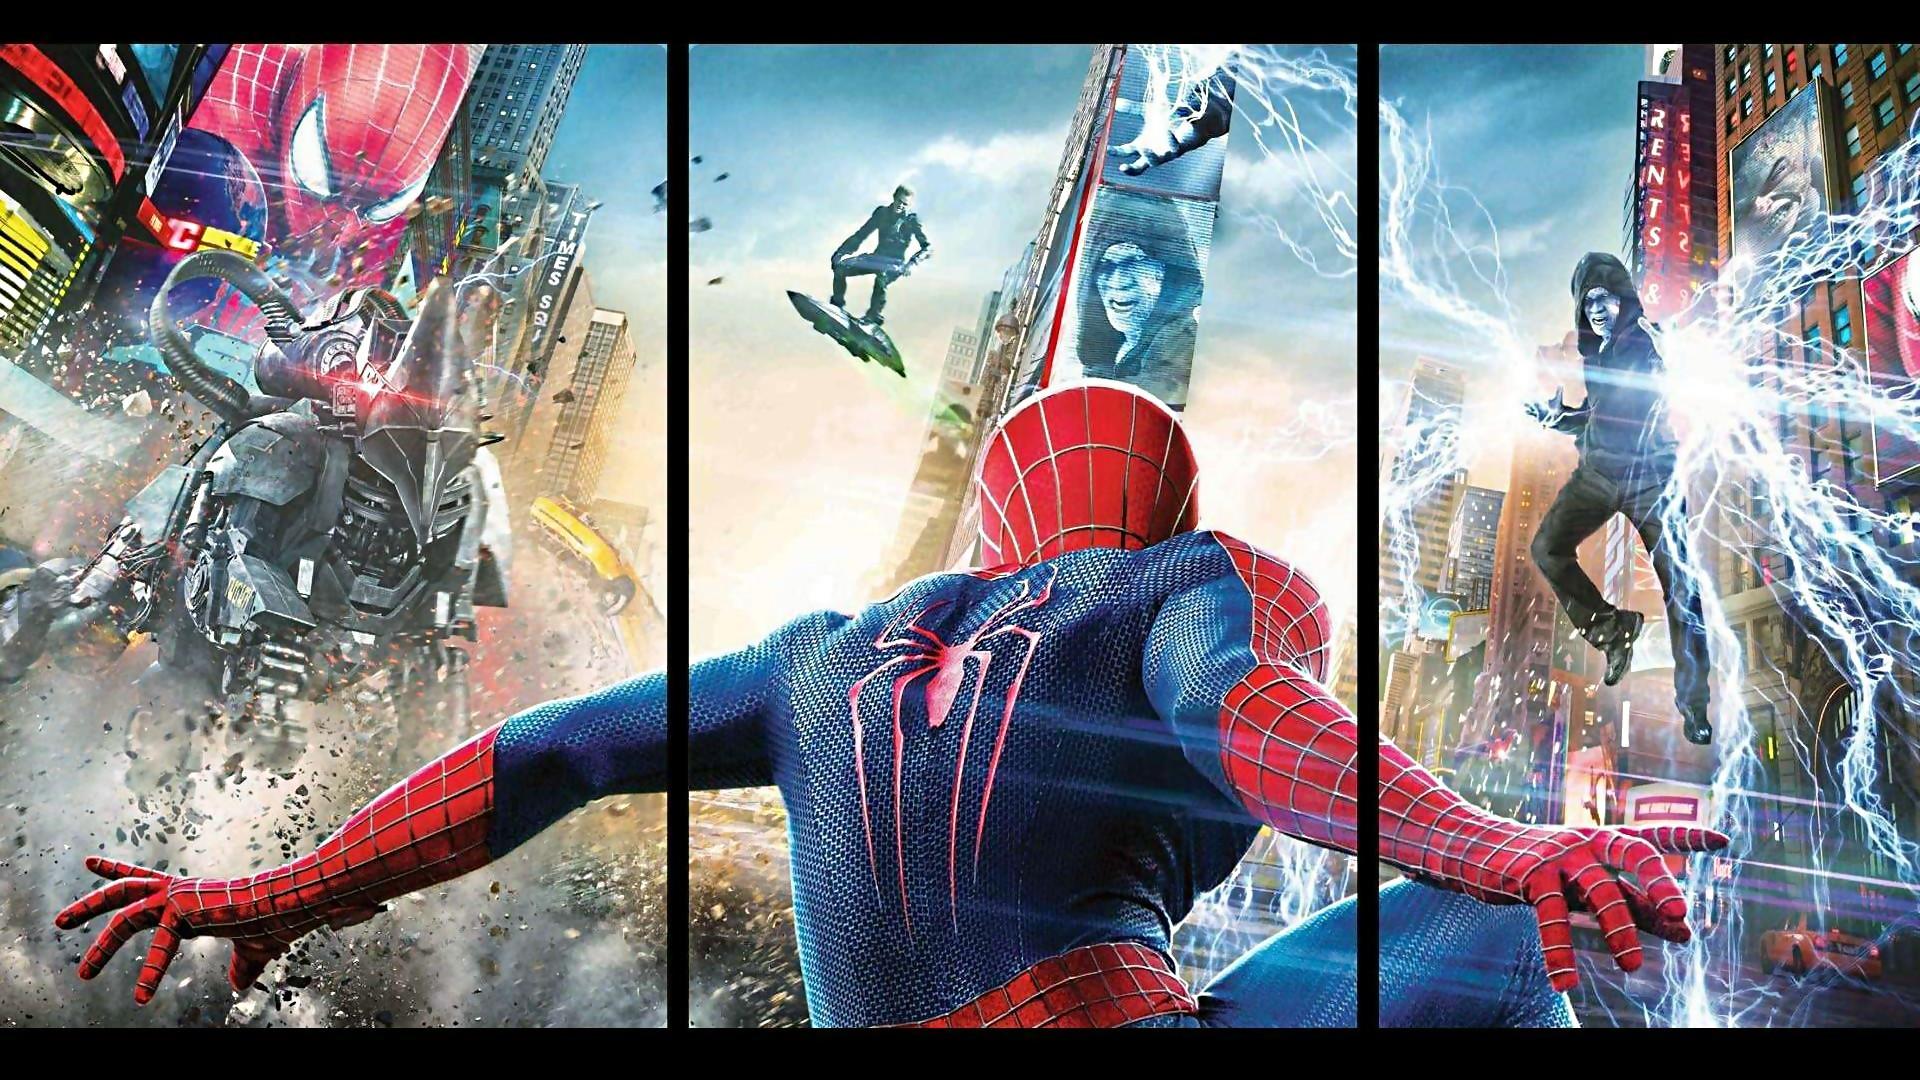 Pictures Of Spiderman Wallpapers  WallpaperSafari